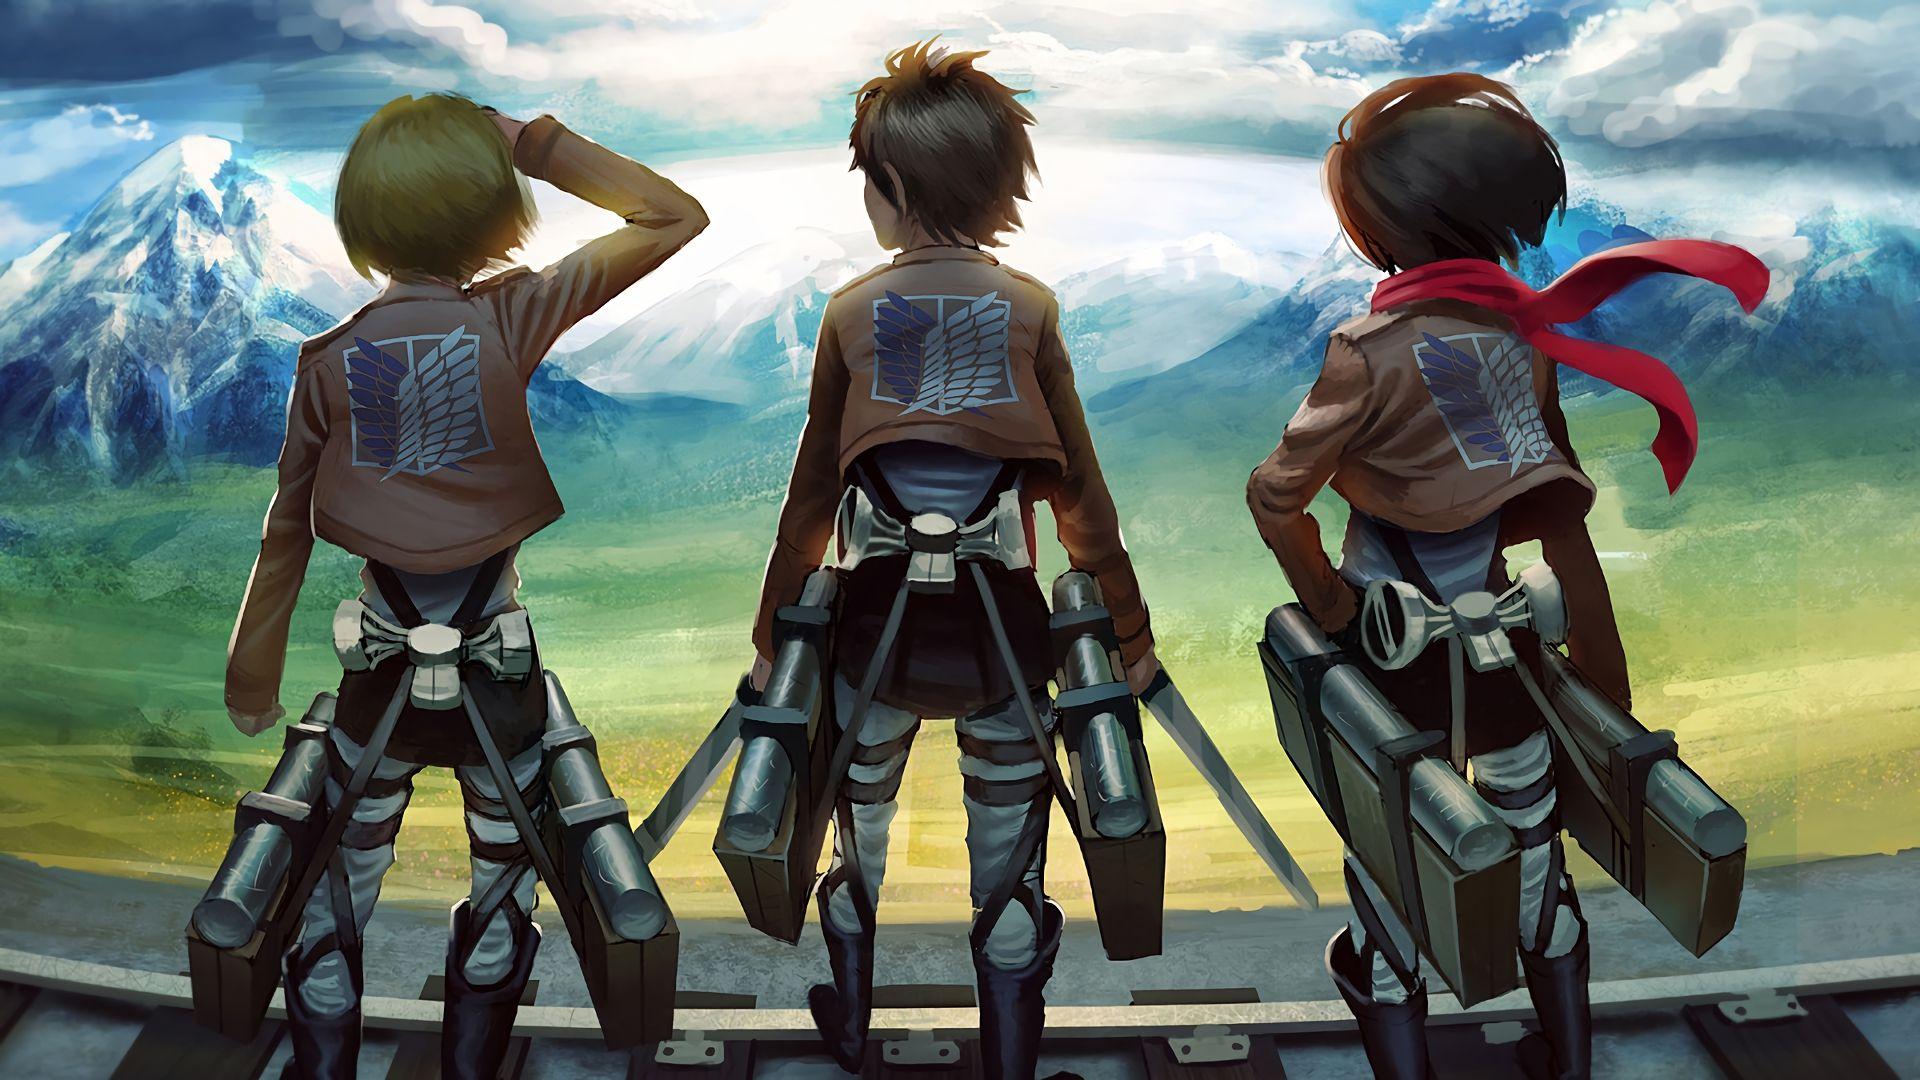 Armin Arlert Eren Yeager Mikasa Ackerman Attack On Titan Shingeki No Kyojin Anime Anime 1920x1080